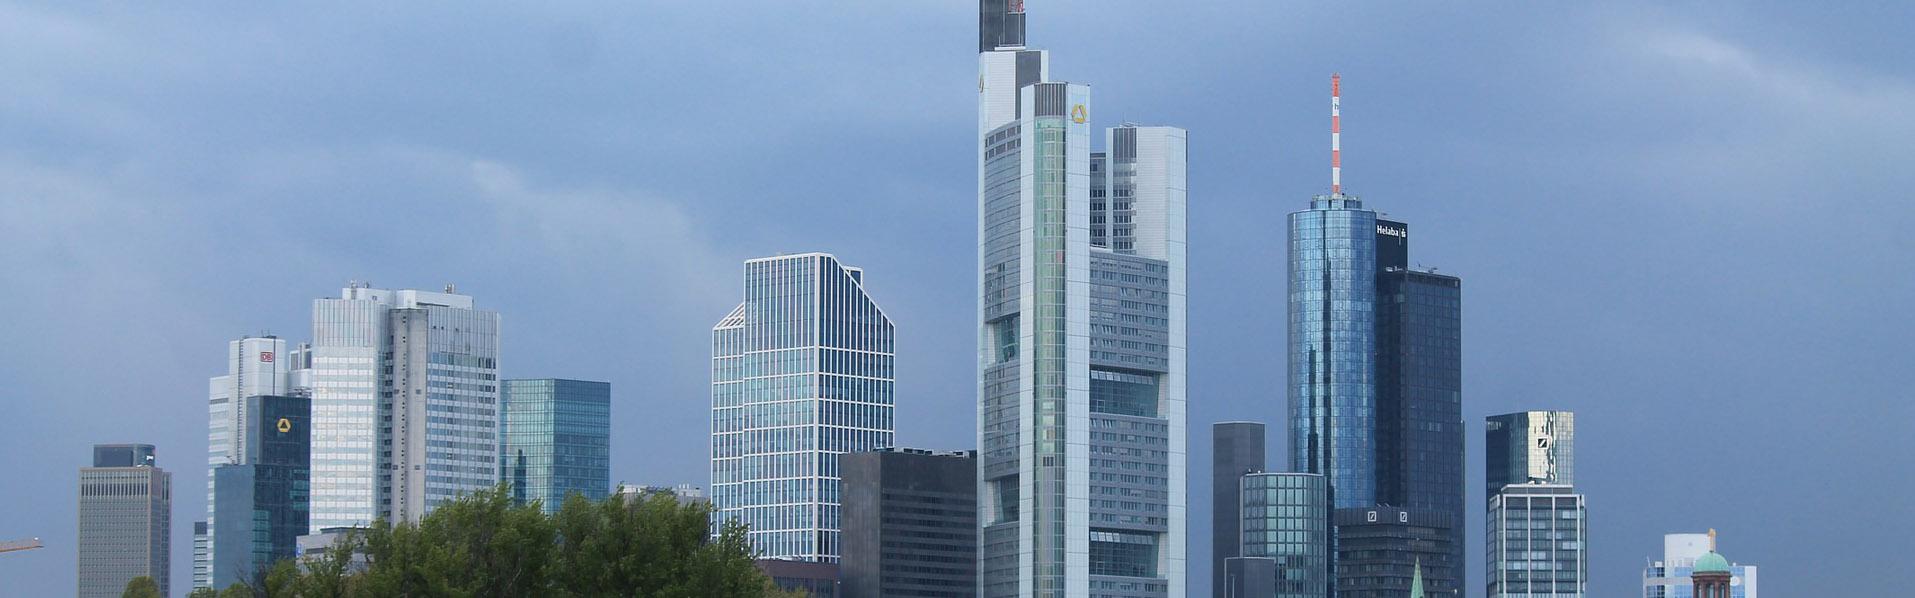 Frankfurt03